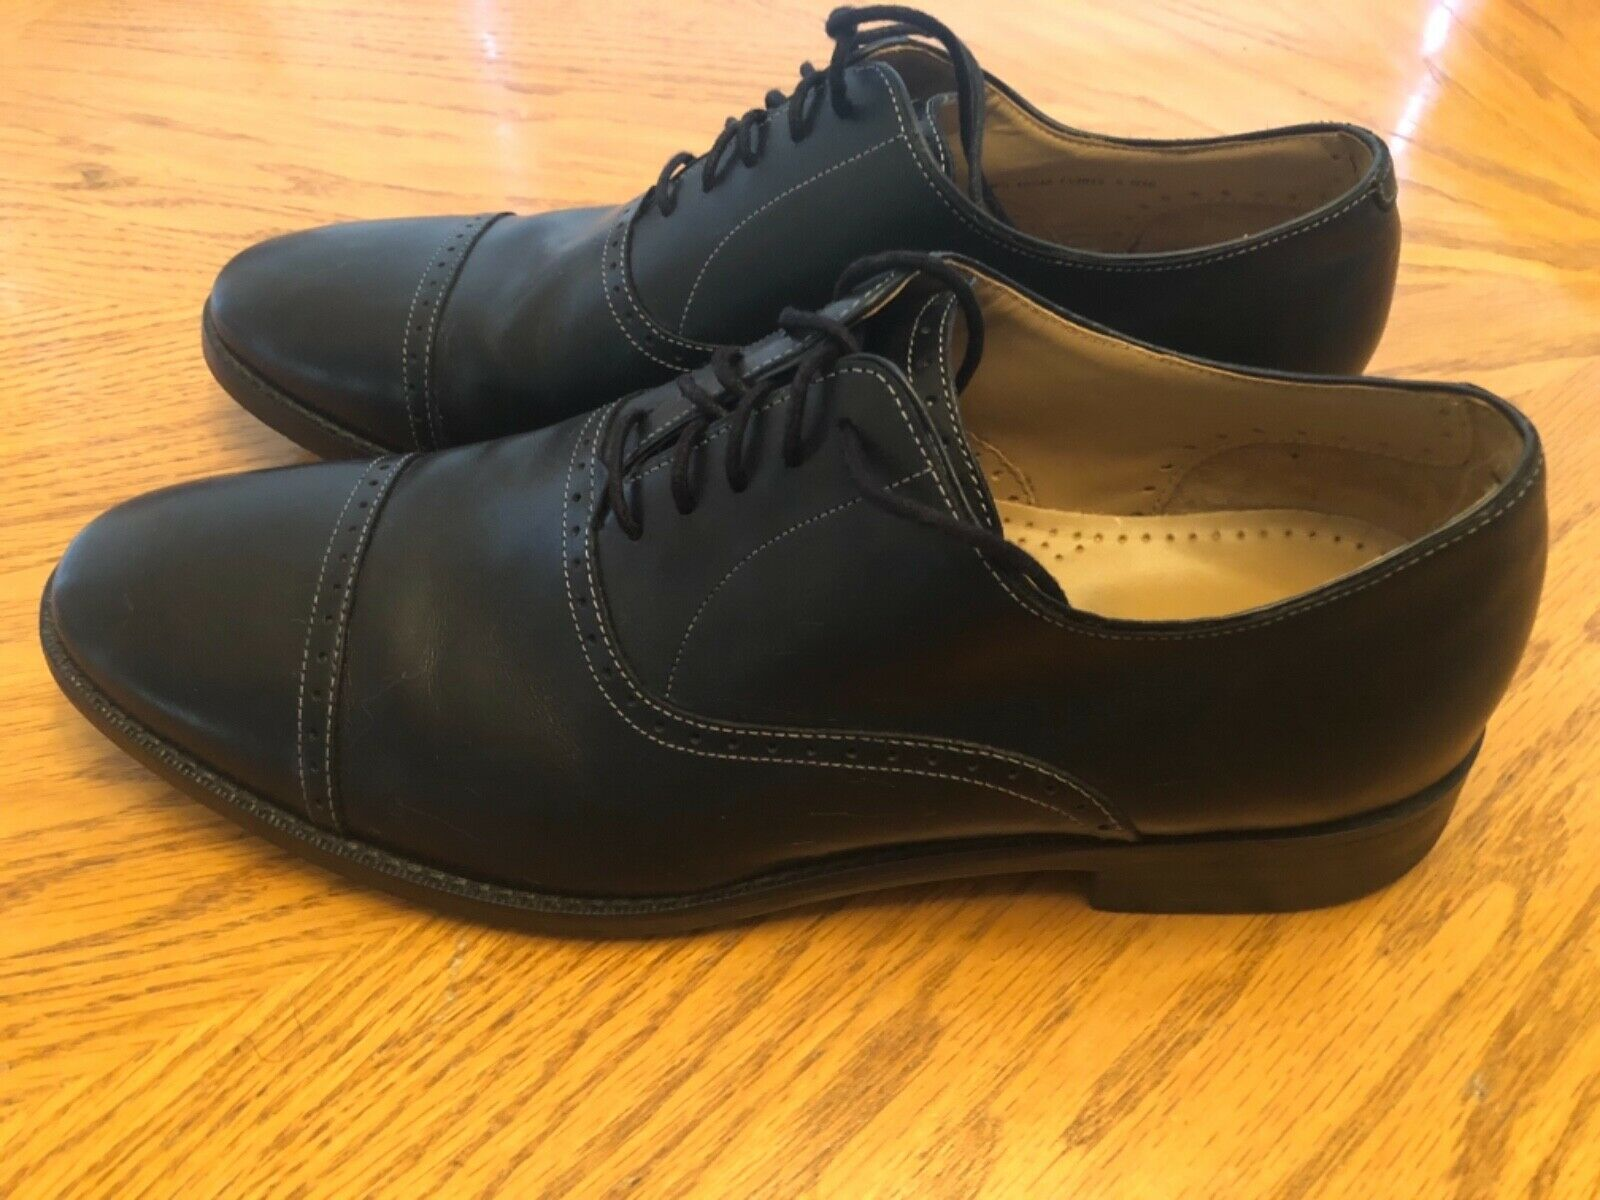 Cole Haan Grand Os Derbies Cambridge en cuir noir Captoe 10.5 m